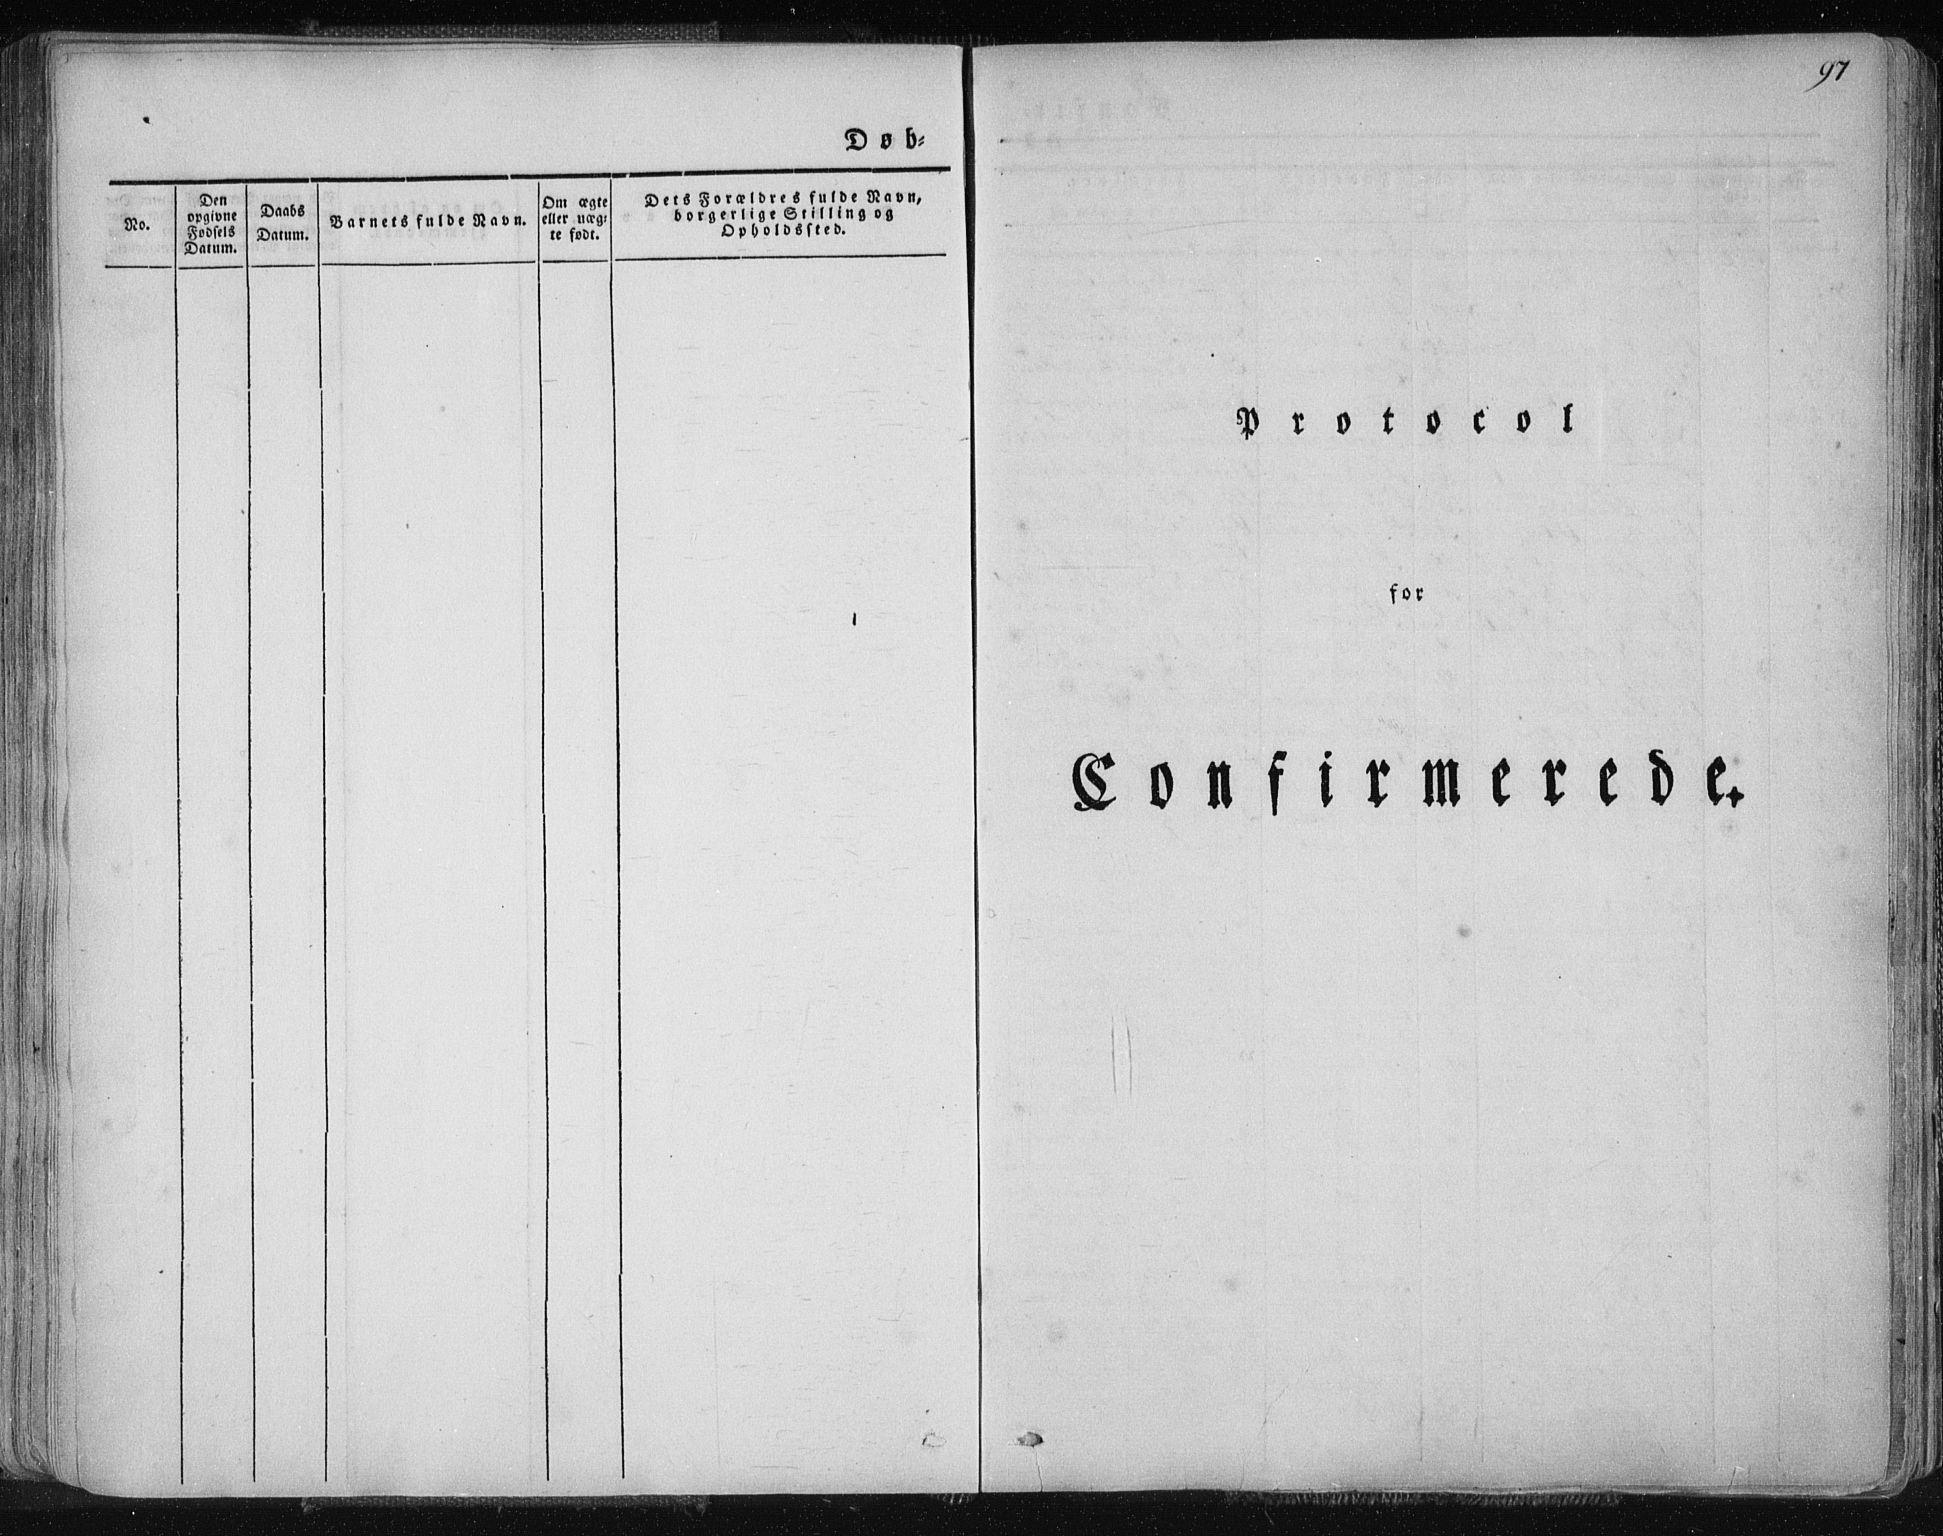 SAT, Ministerialprotokoller, klokkerbøker og fødselsregistre - Nordland, 827/L0390: Ministerialbok nr. 827A02, 1826-1841, s. 97